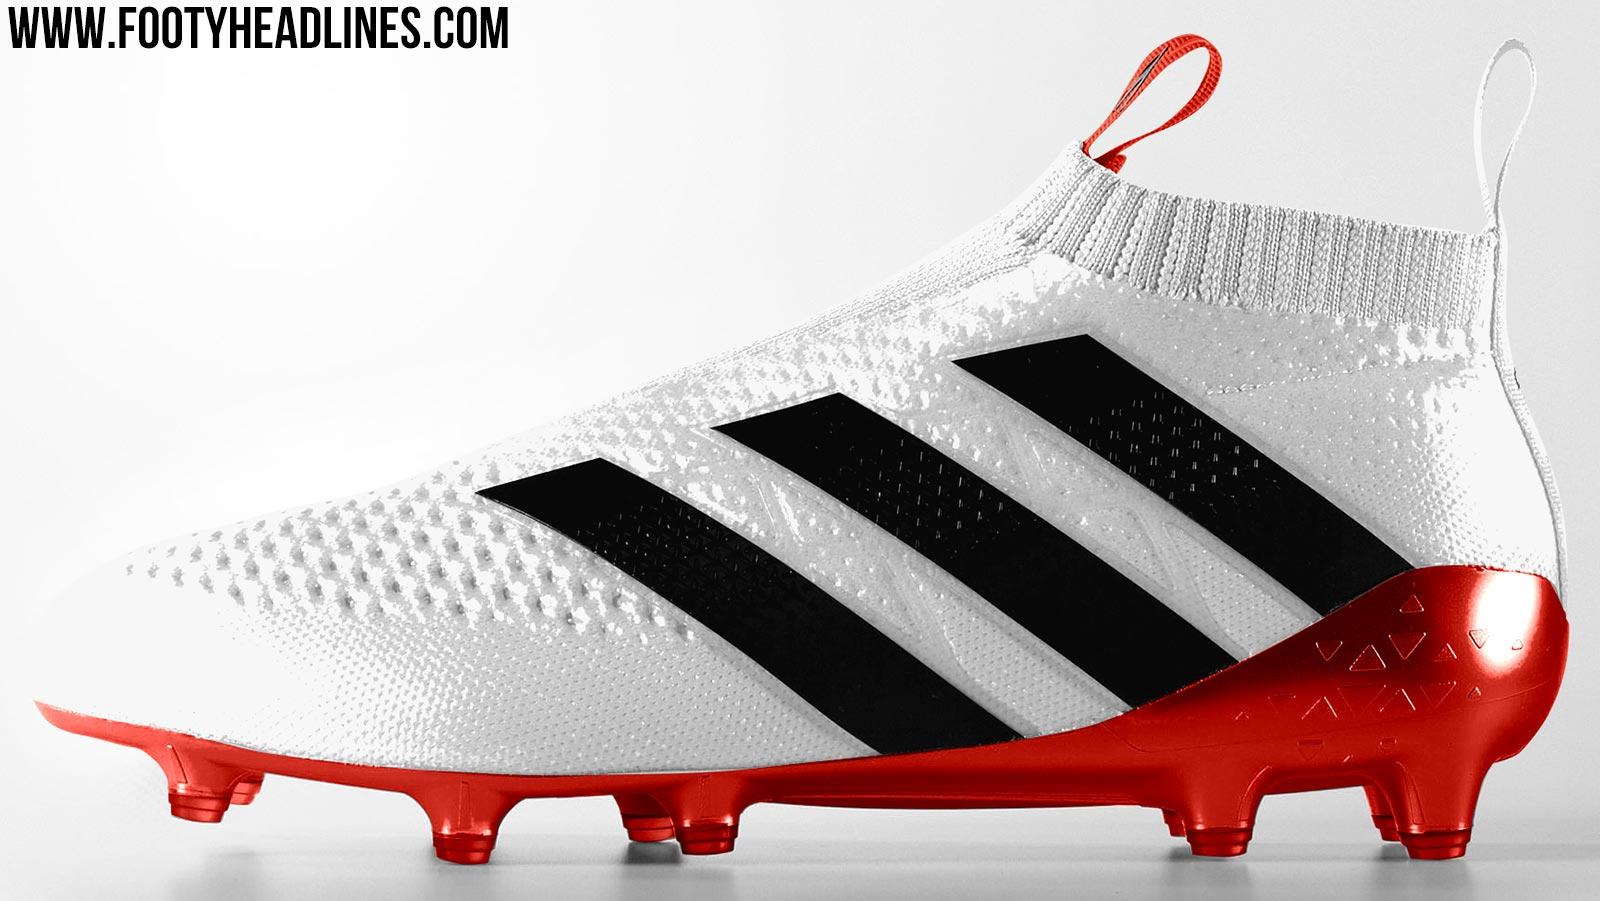 Adidas Ace 16 Purecontrol White